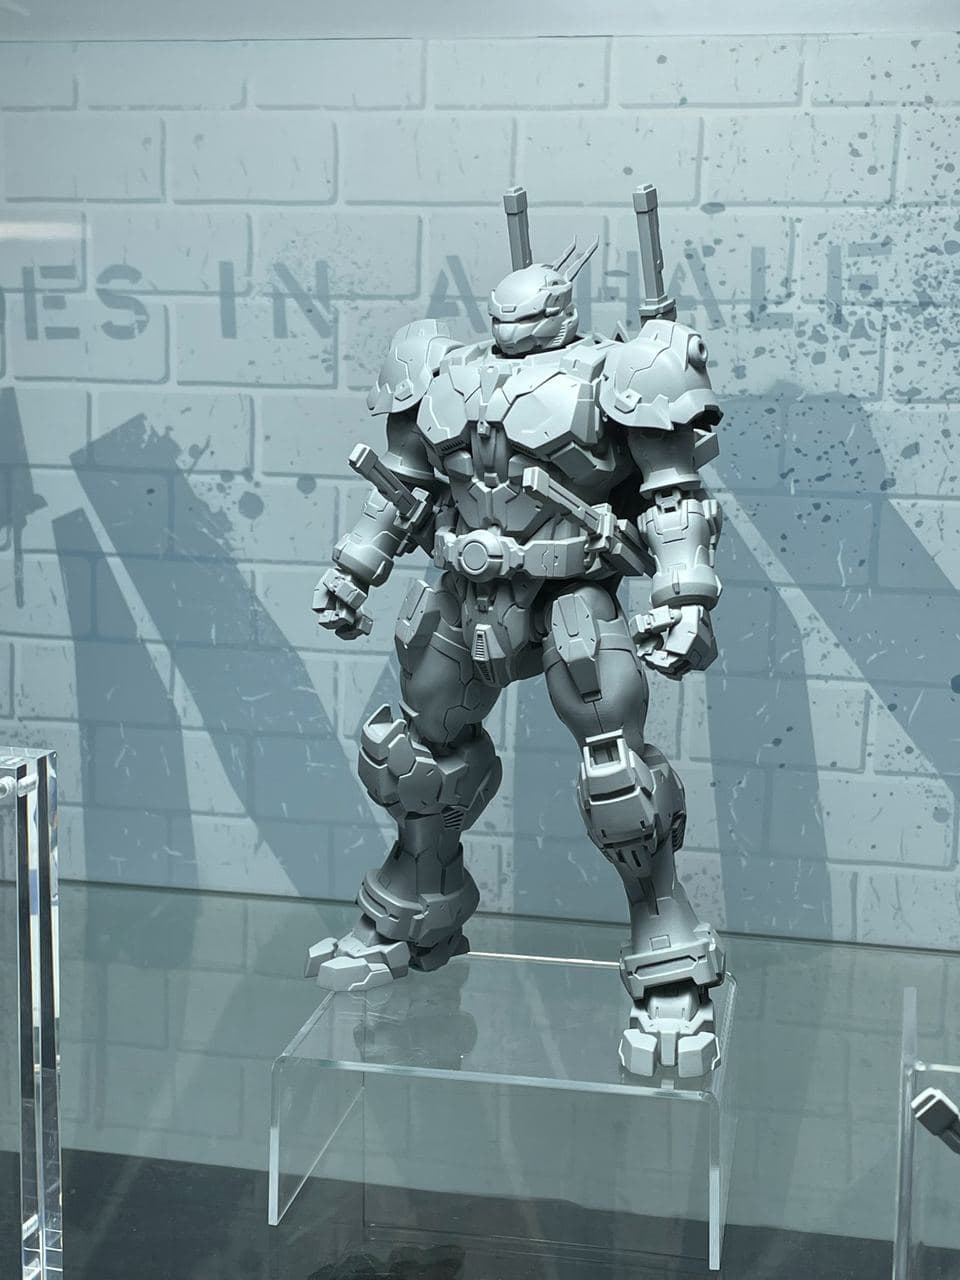 Link a Teenage Mutant Ninja Turtles prototipo per le Turtles robotiche di Heat Boys x Snap Desing – (2)